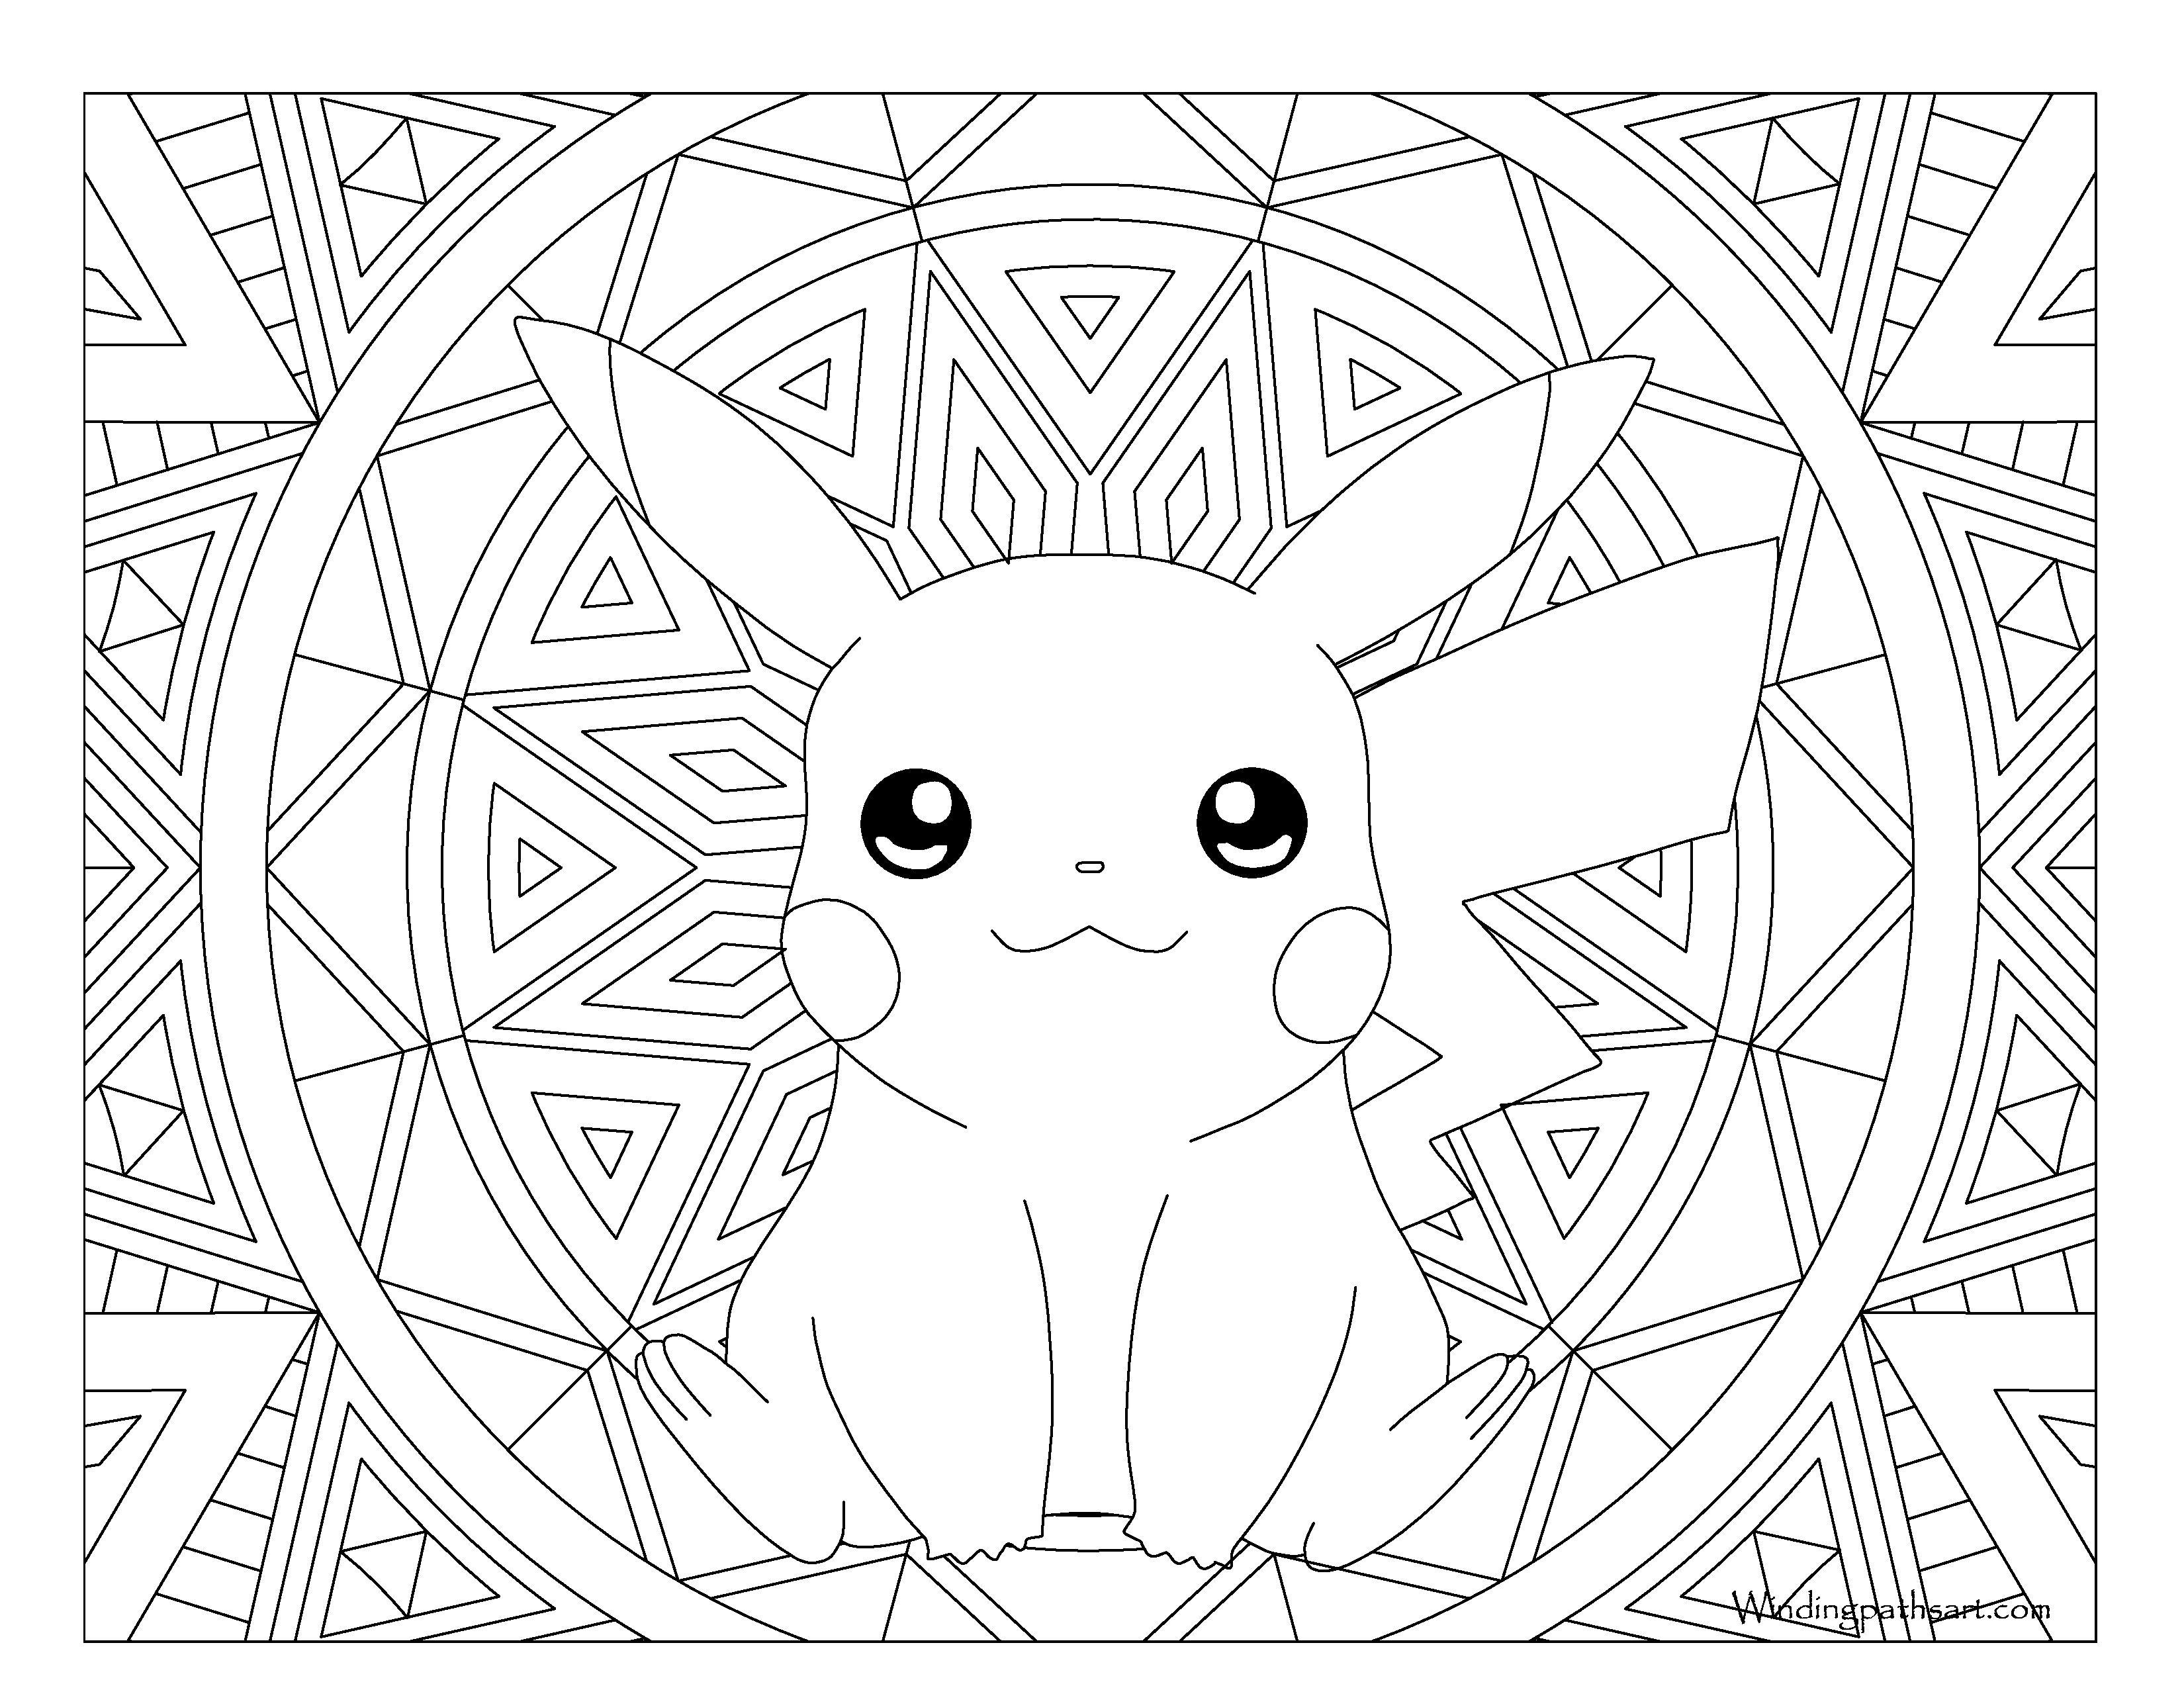 Coloring Pages Pokemon 025 Pikachu Pokemon Coloring Page Windingpathsart Entitlementtrap Com Pikachu Coloring Page Pokemon Coloring Sheets Pokemon Coloring Pages [ 2550 x 3300 Pixel ]